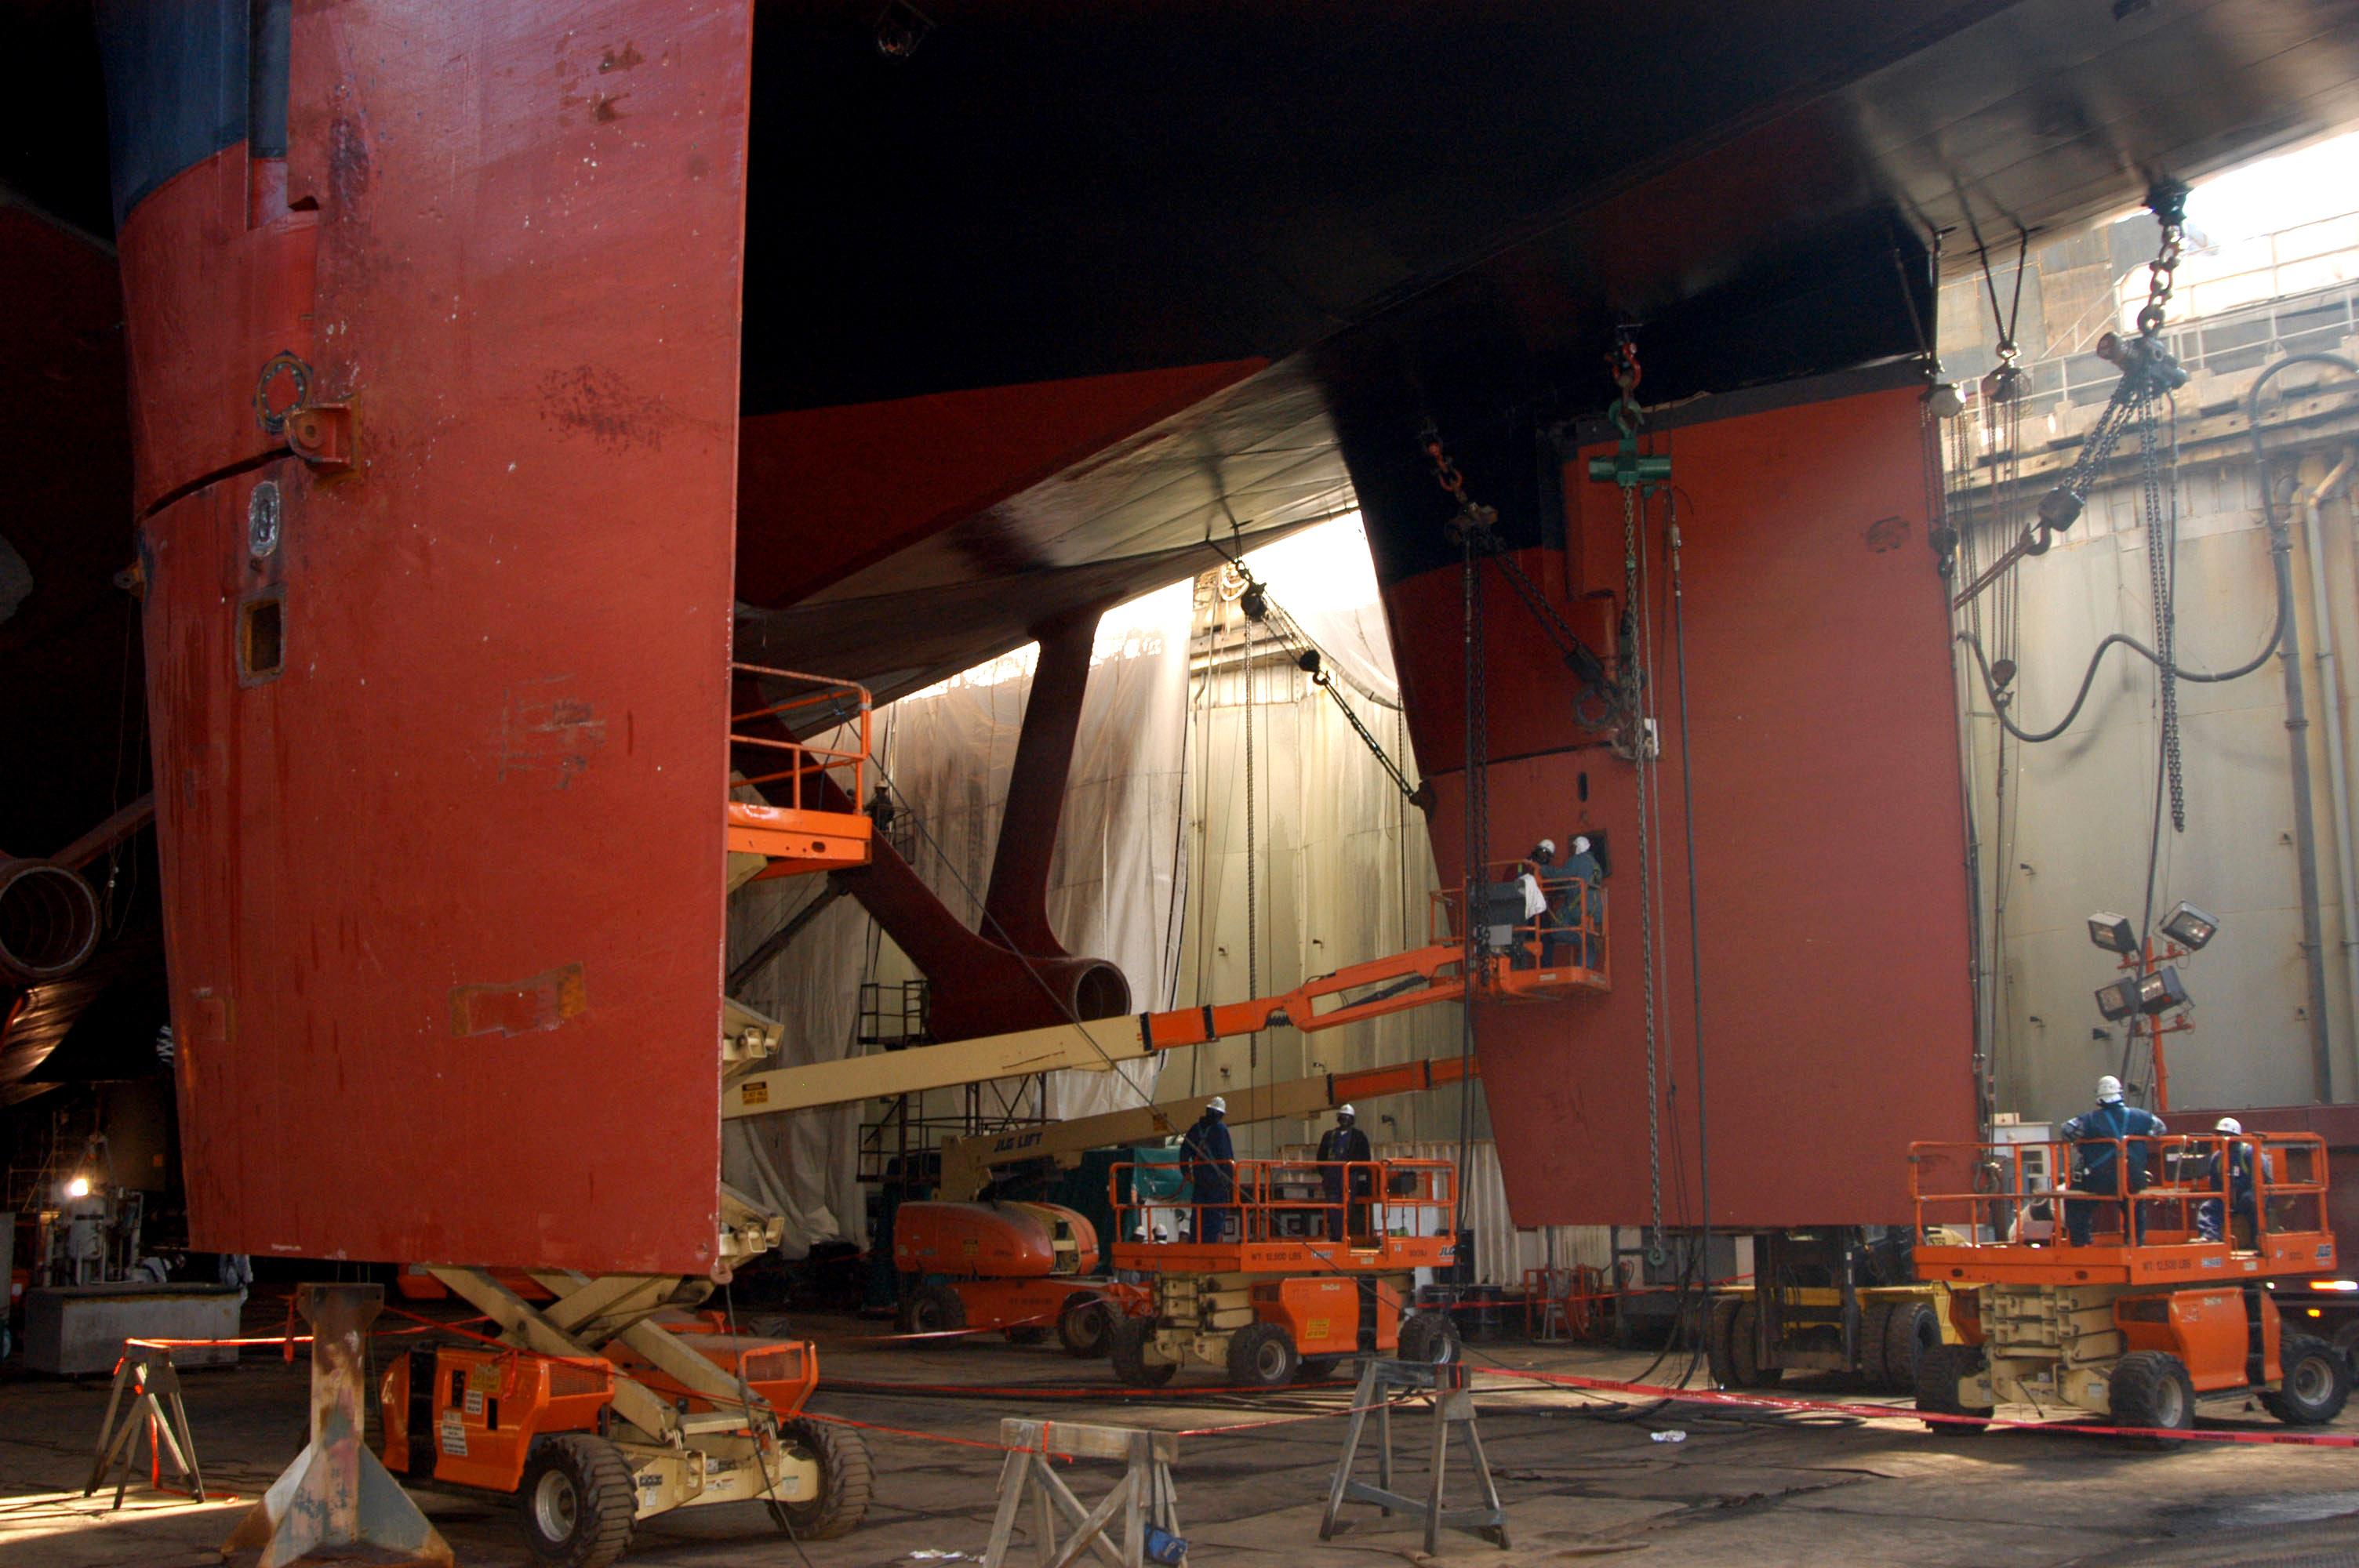 Workers from Northrop Grumman Newport News shipyard install